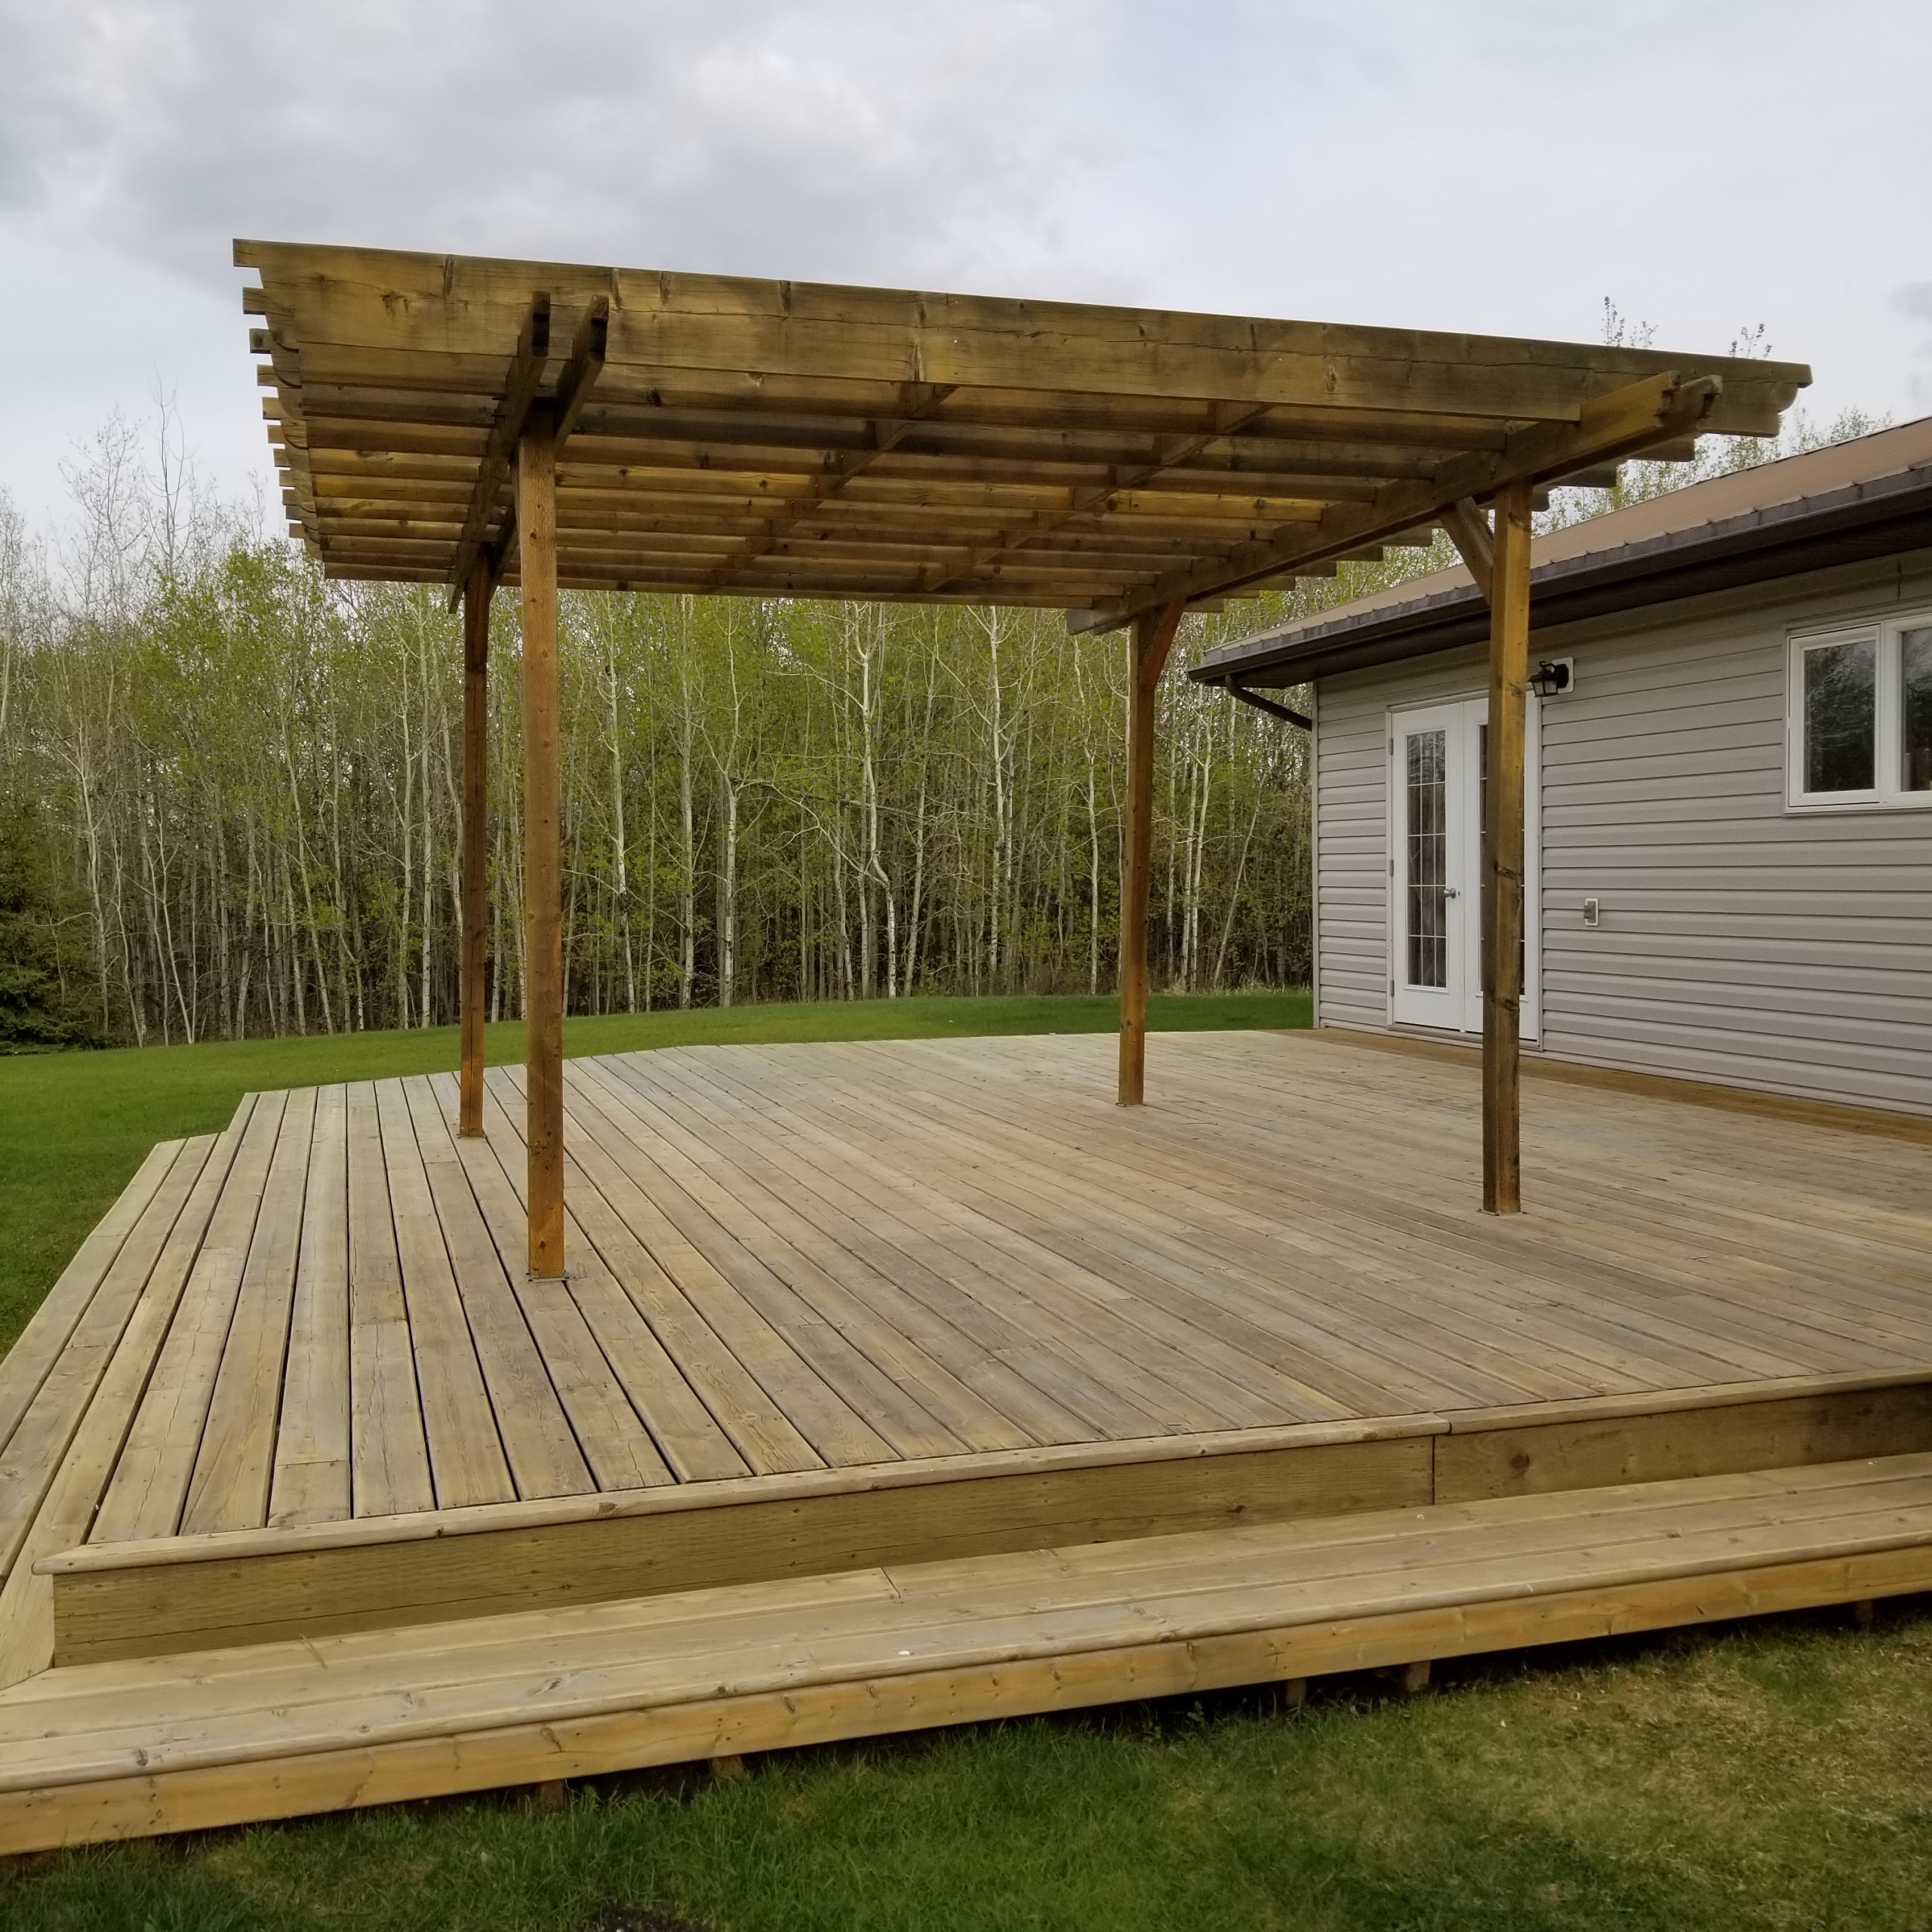 Deck Stain Remove, Refresh